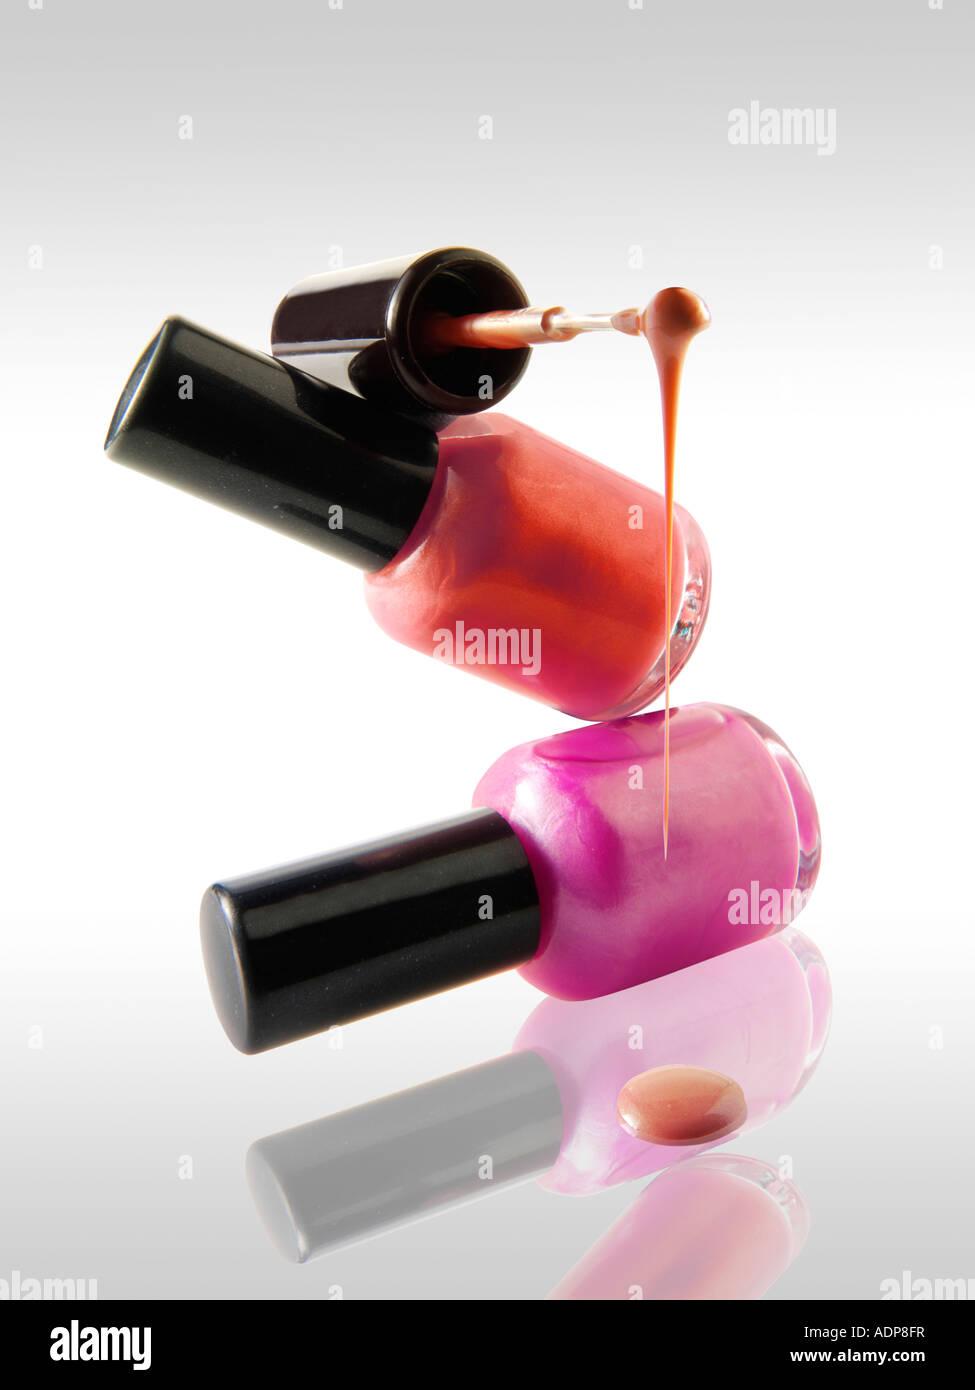 2 Nail Polish bottles balanced on each other in a fun way with a nail varnish brush balanced ontop dripping nail - Stock Image